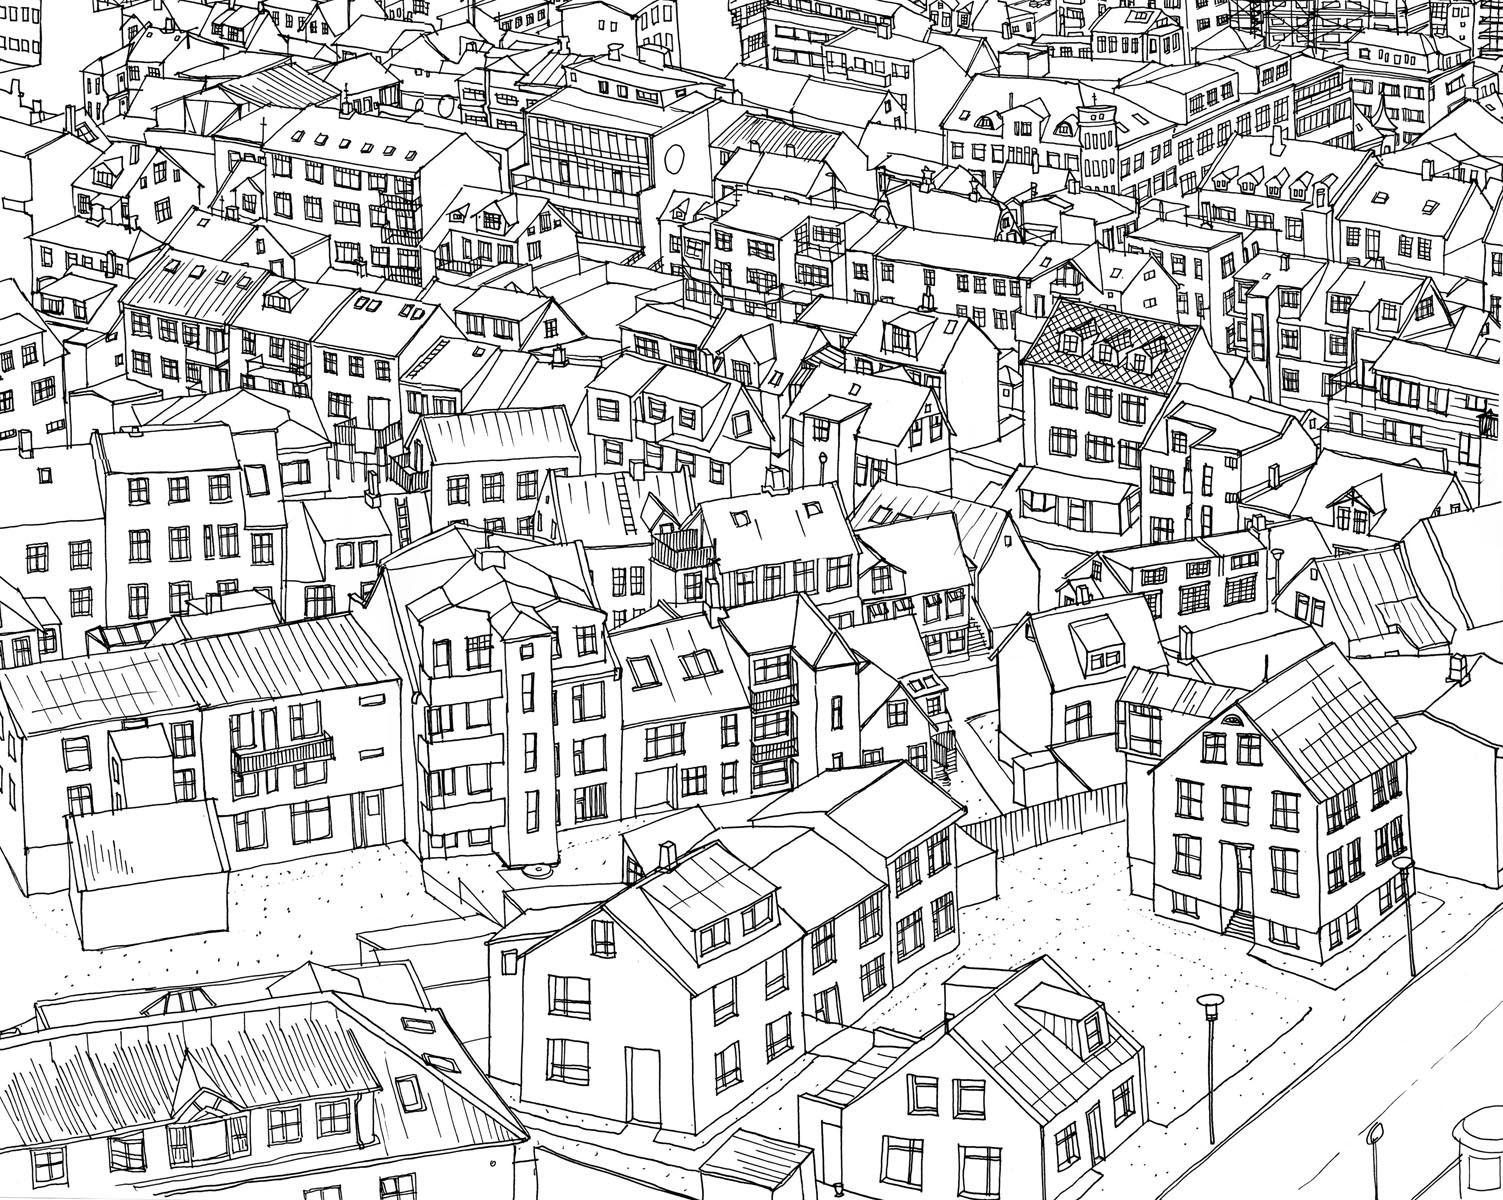 renee-lusano-reykjavik-illustration.jpg